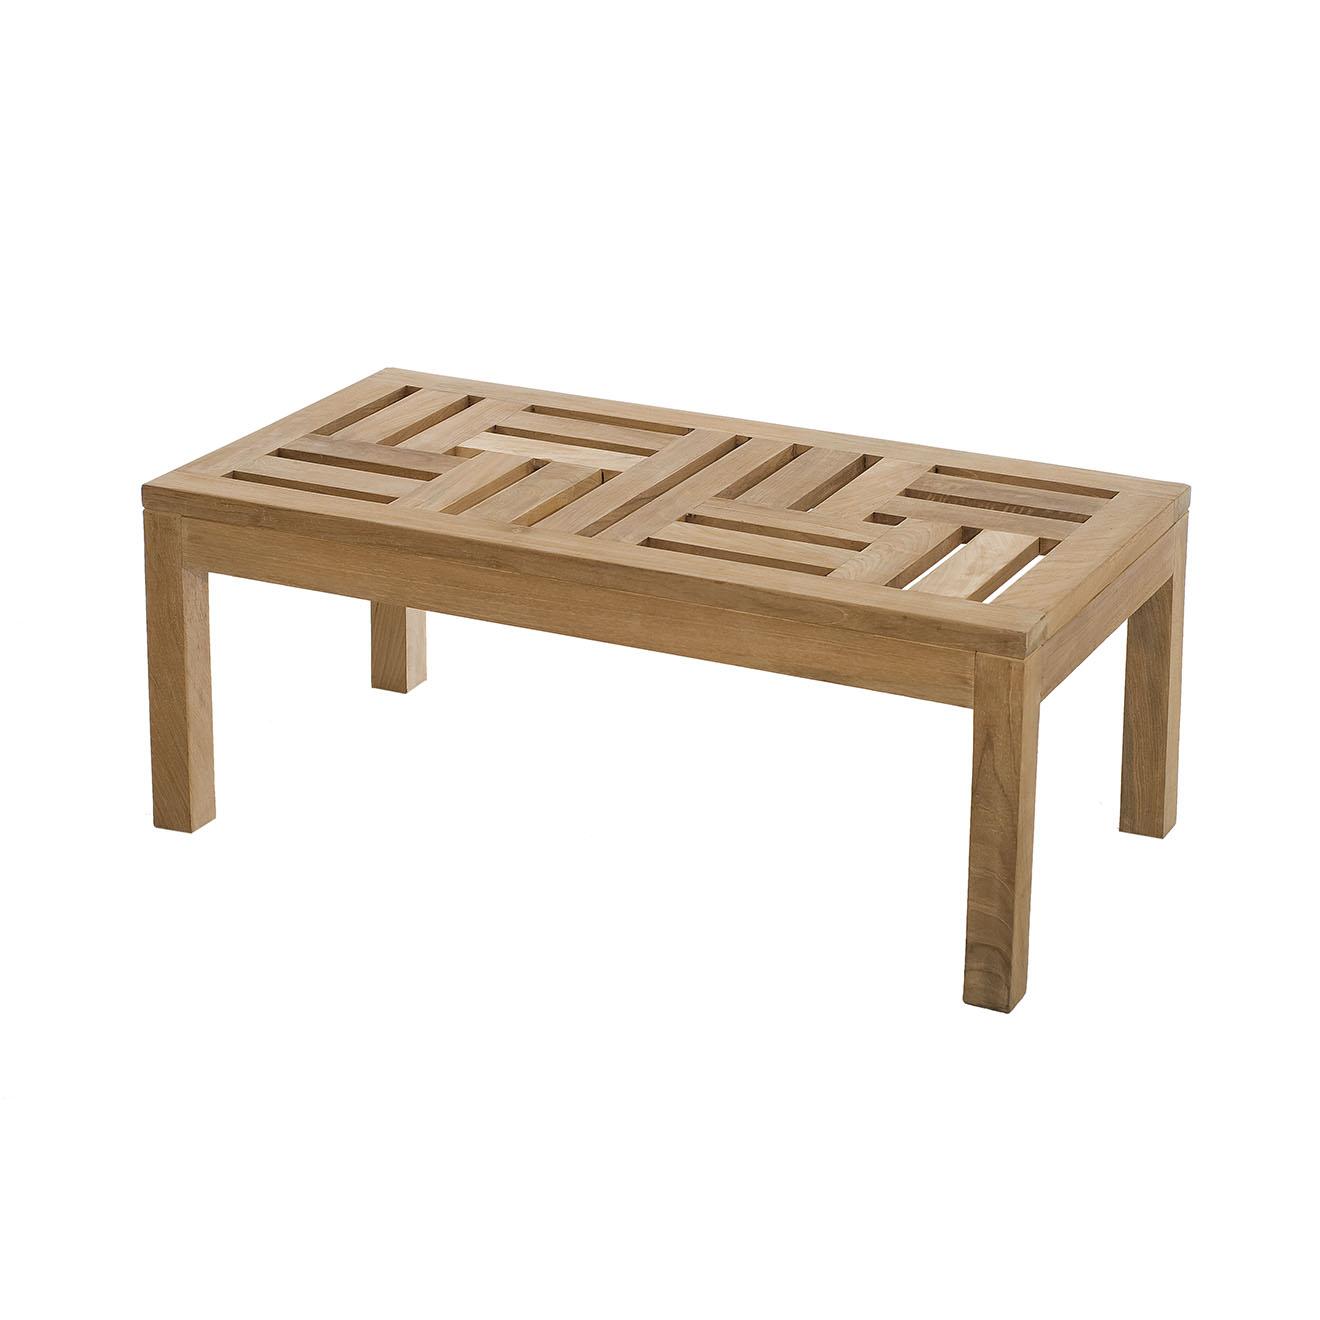 Table basse Fun teck massif - 100x50x40 cm